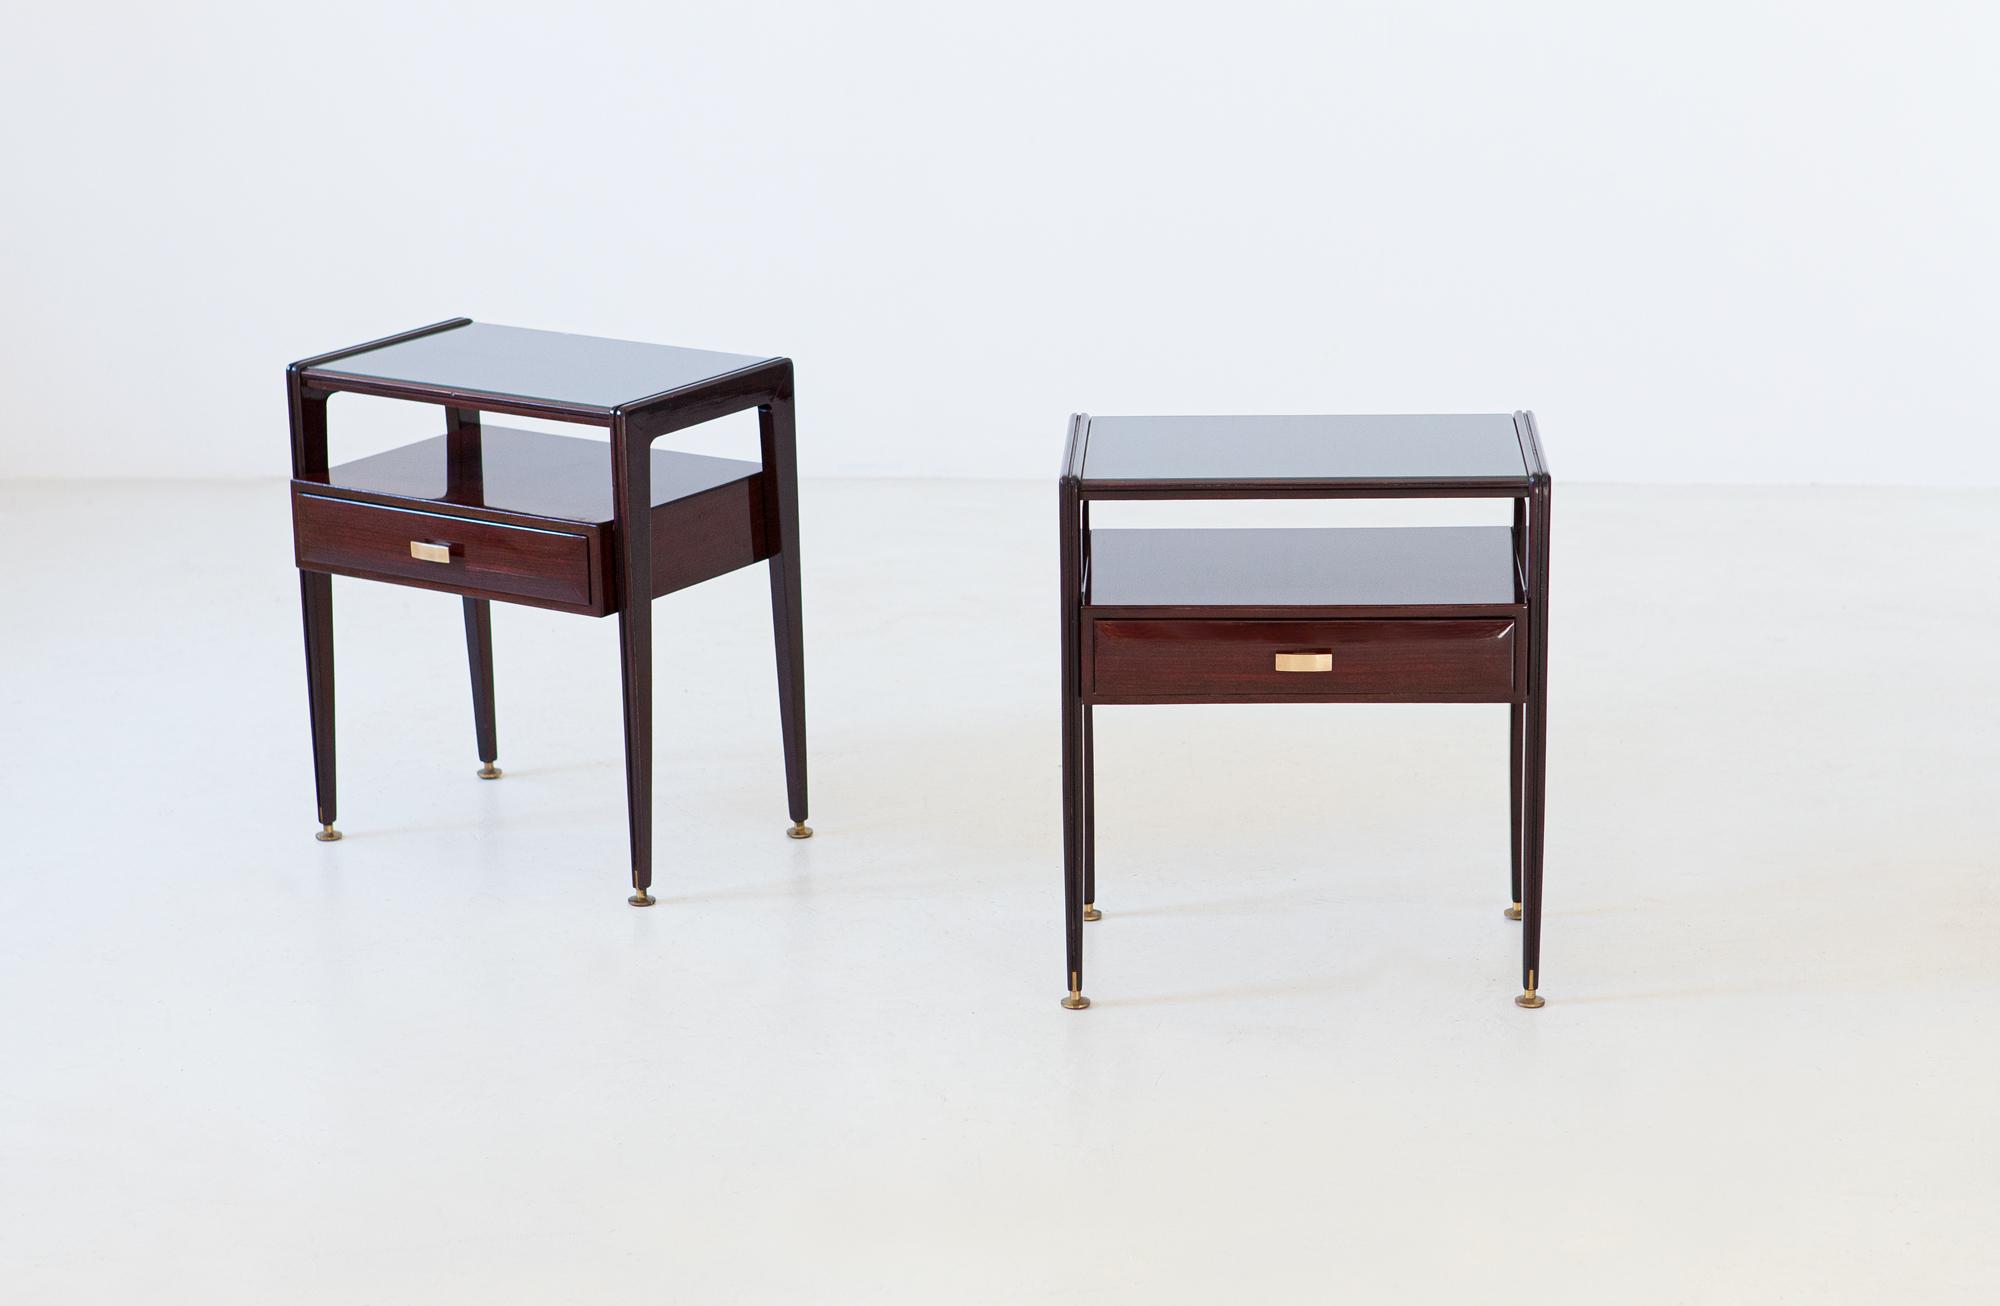 1950s-italian-nightstands-in-rosewood.with-glass-top-4-bt84